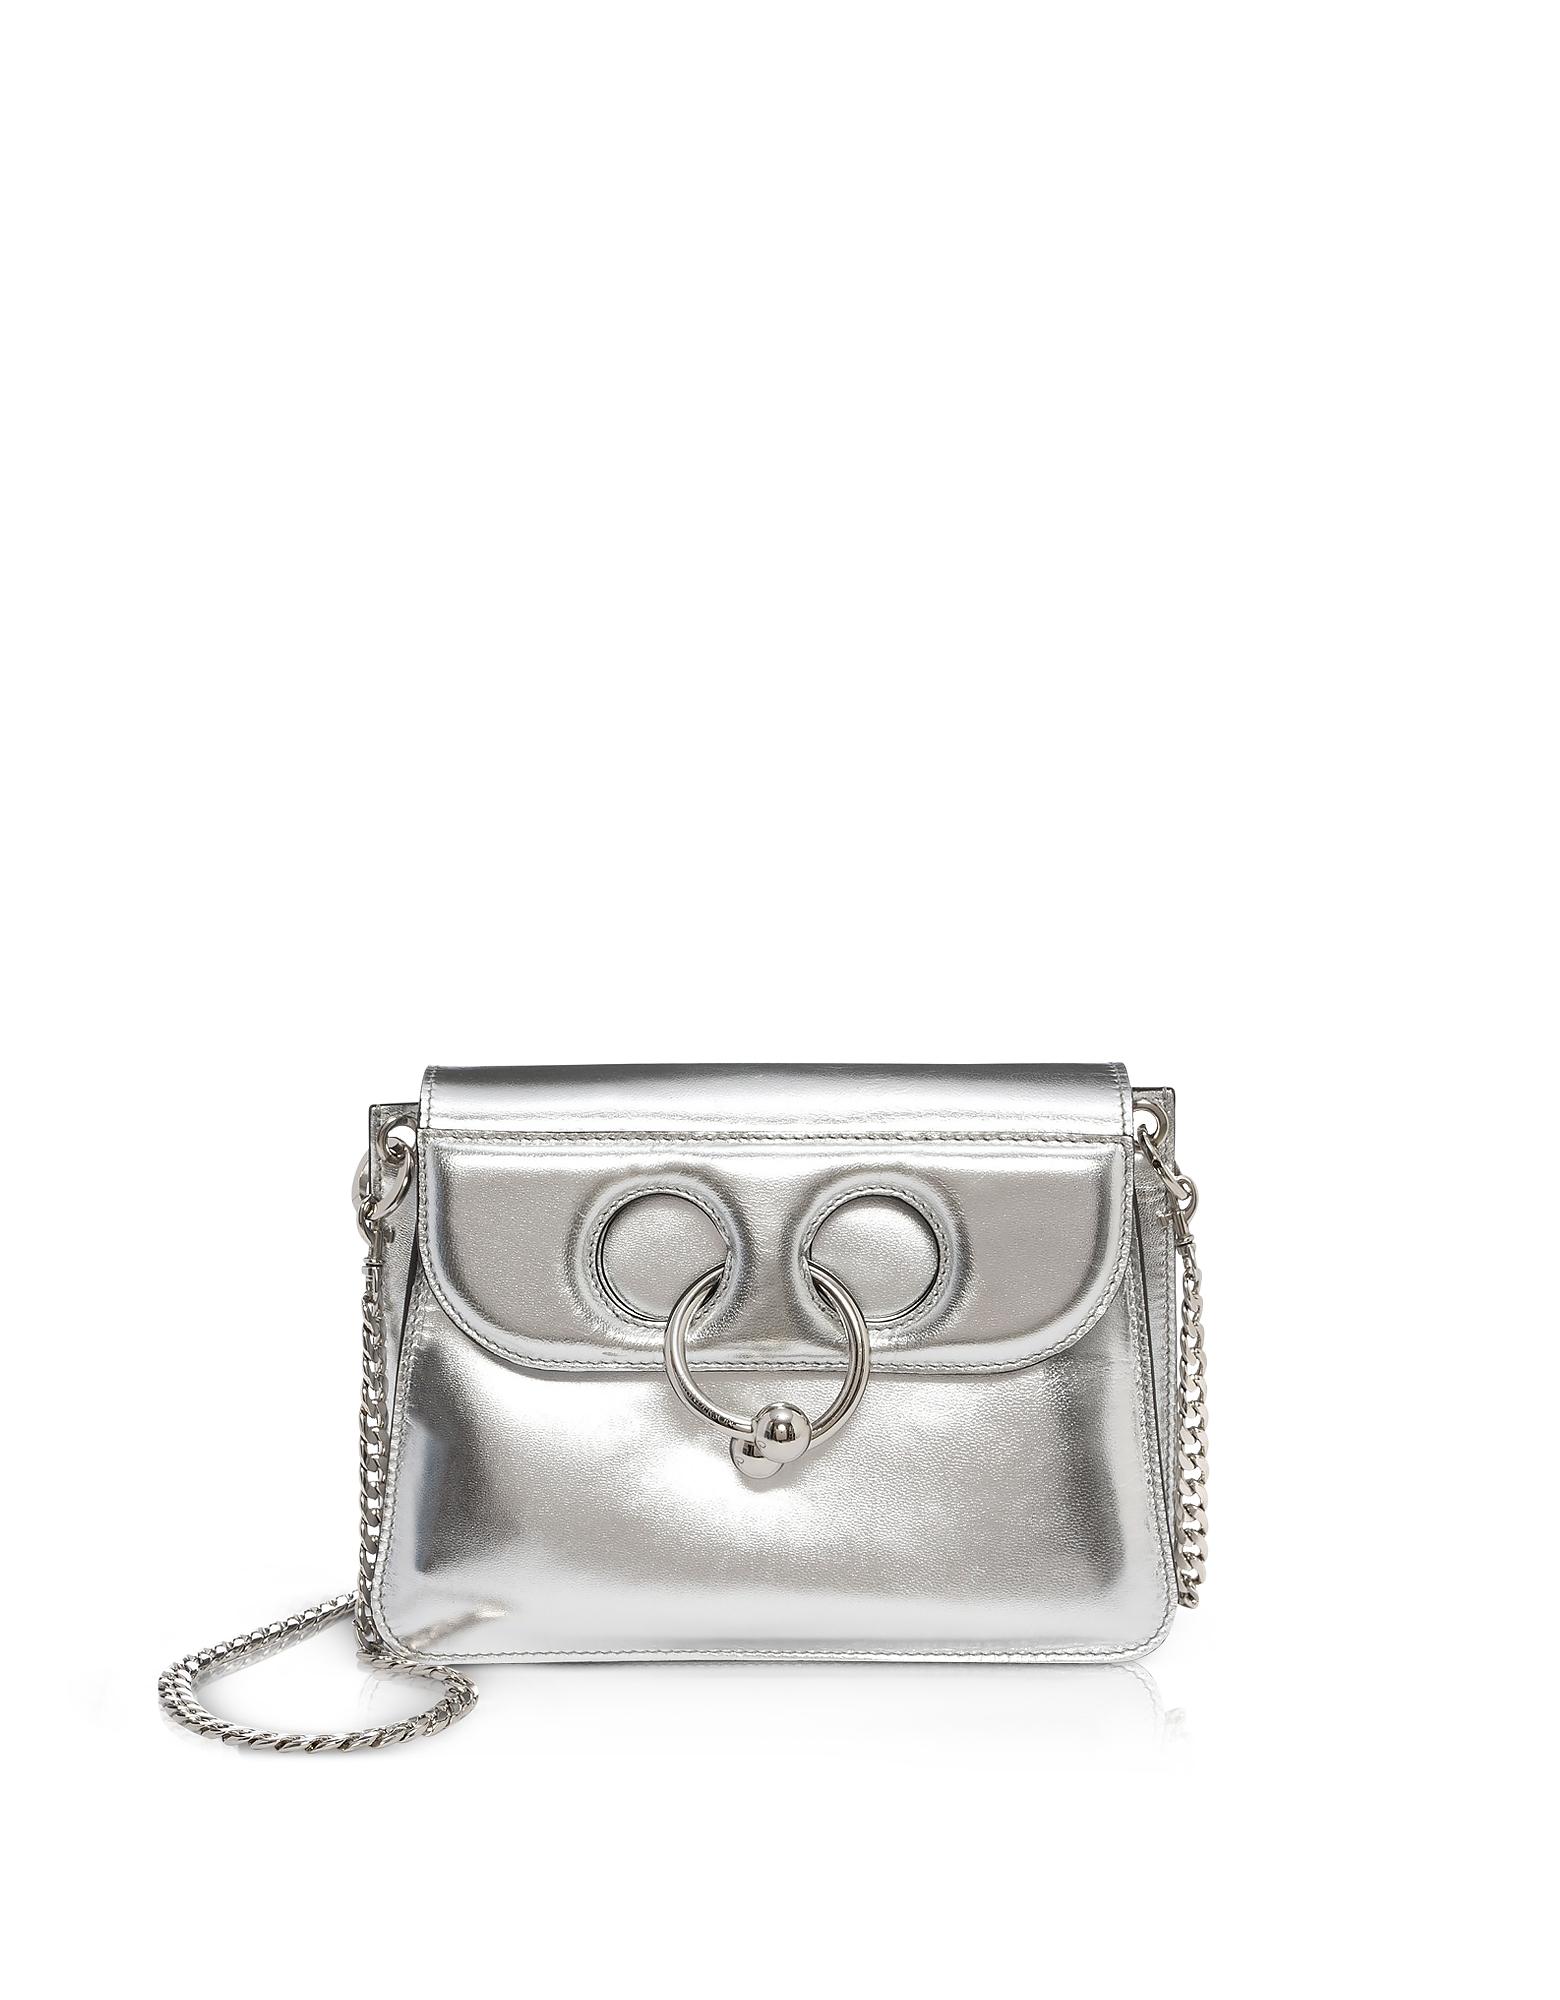 J.W. Anderson Handbags, Silver Leather Mini Pierce Bag